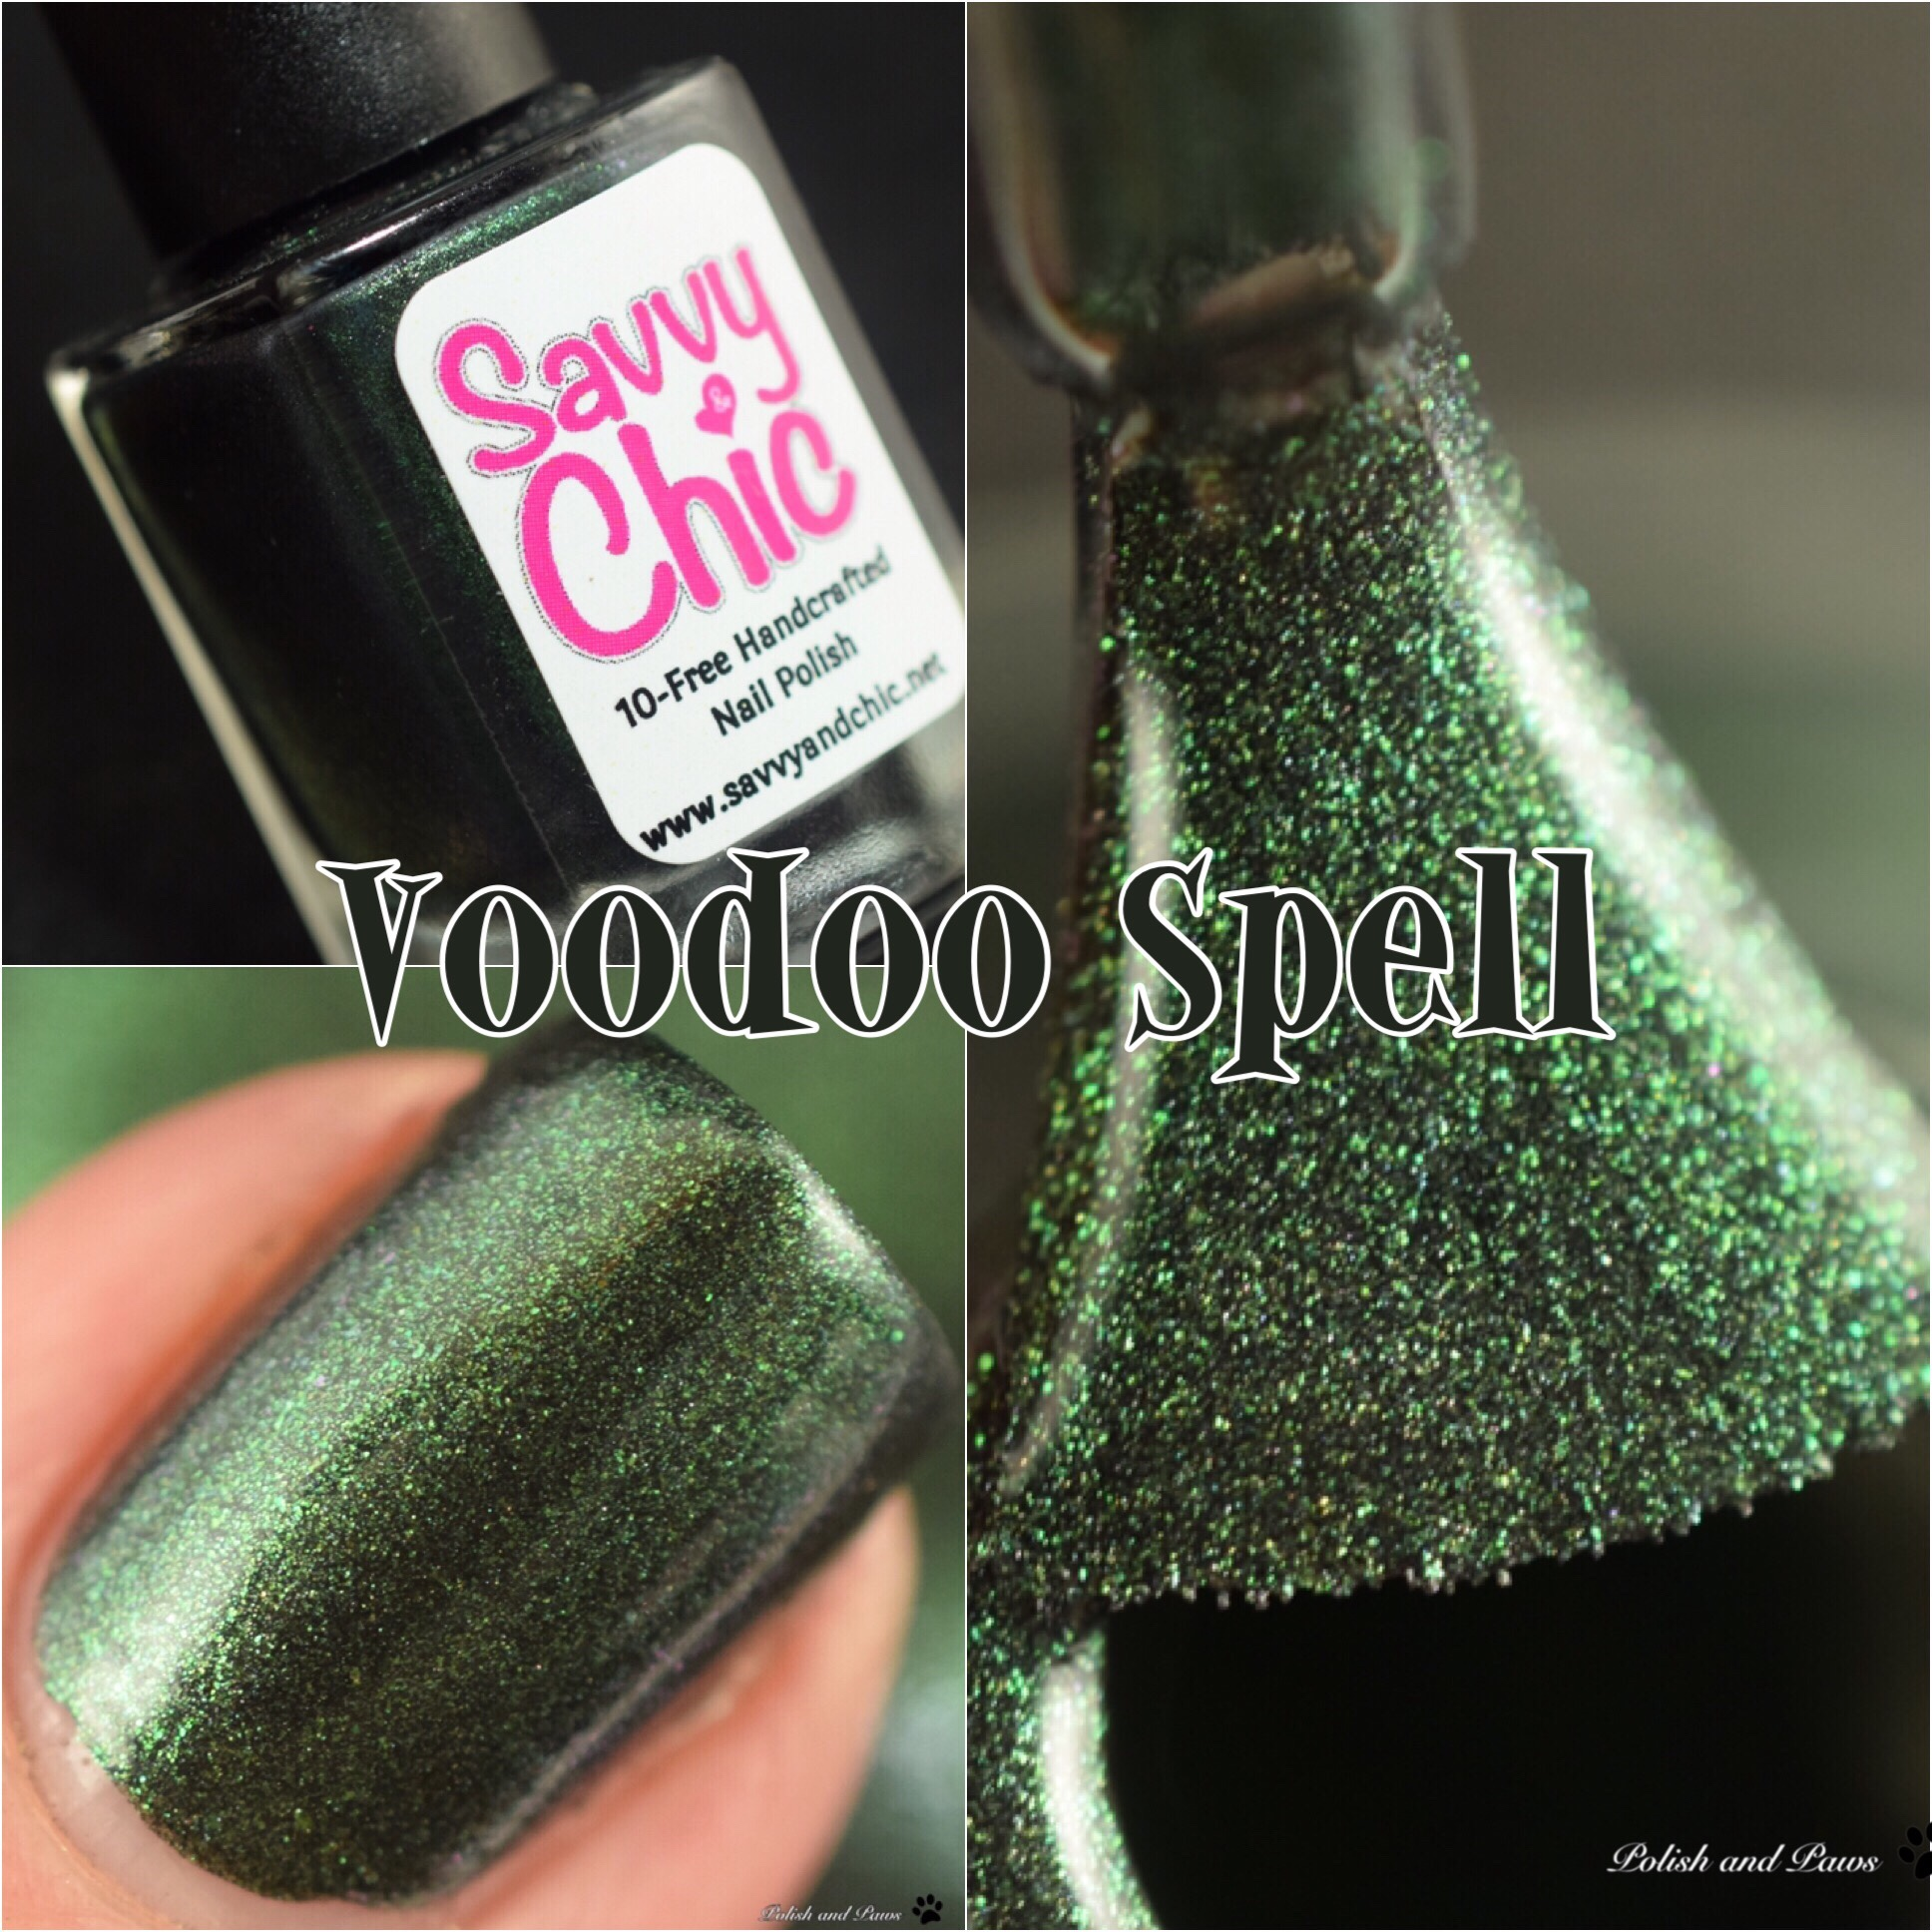 Savvy & Chic Voodoo Spell